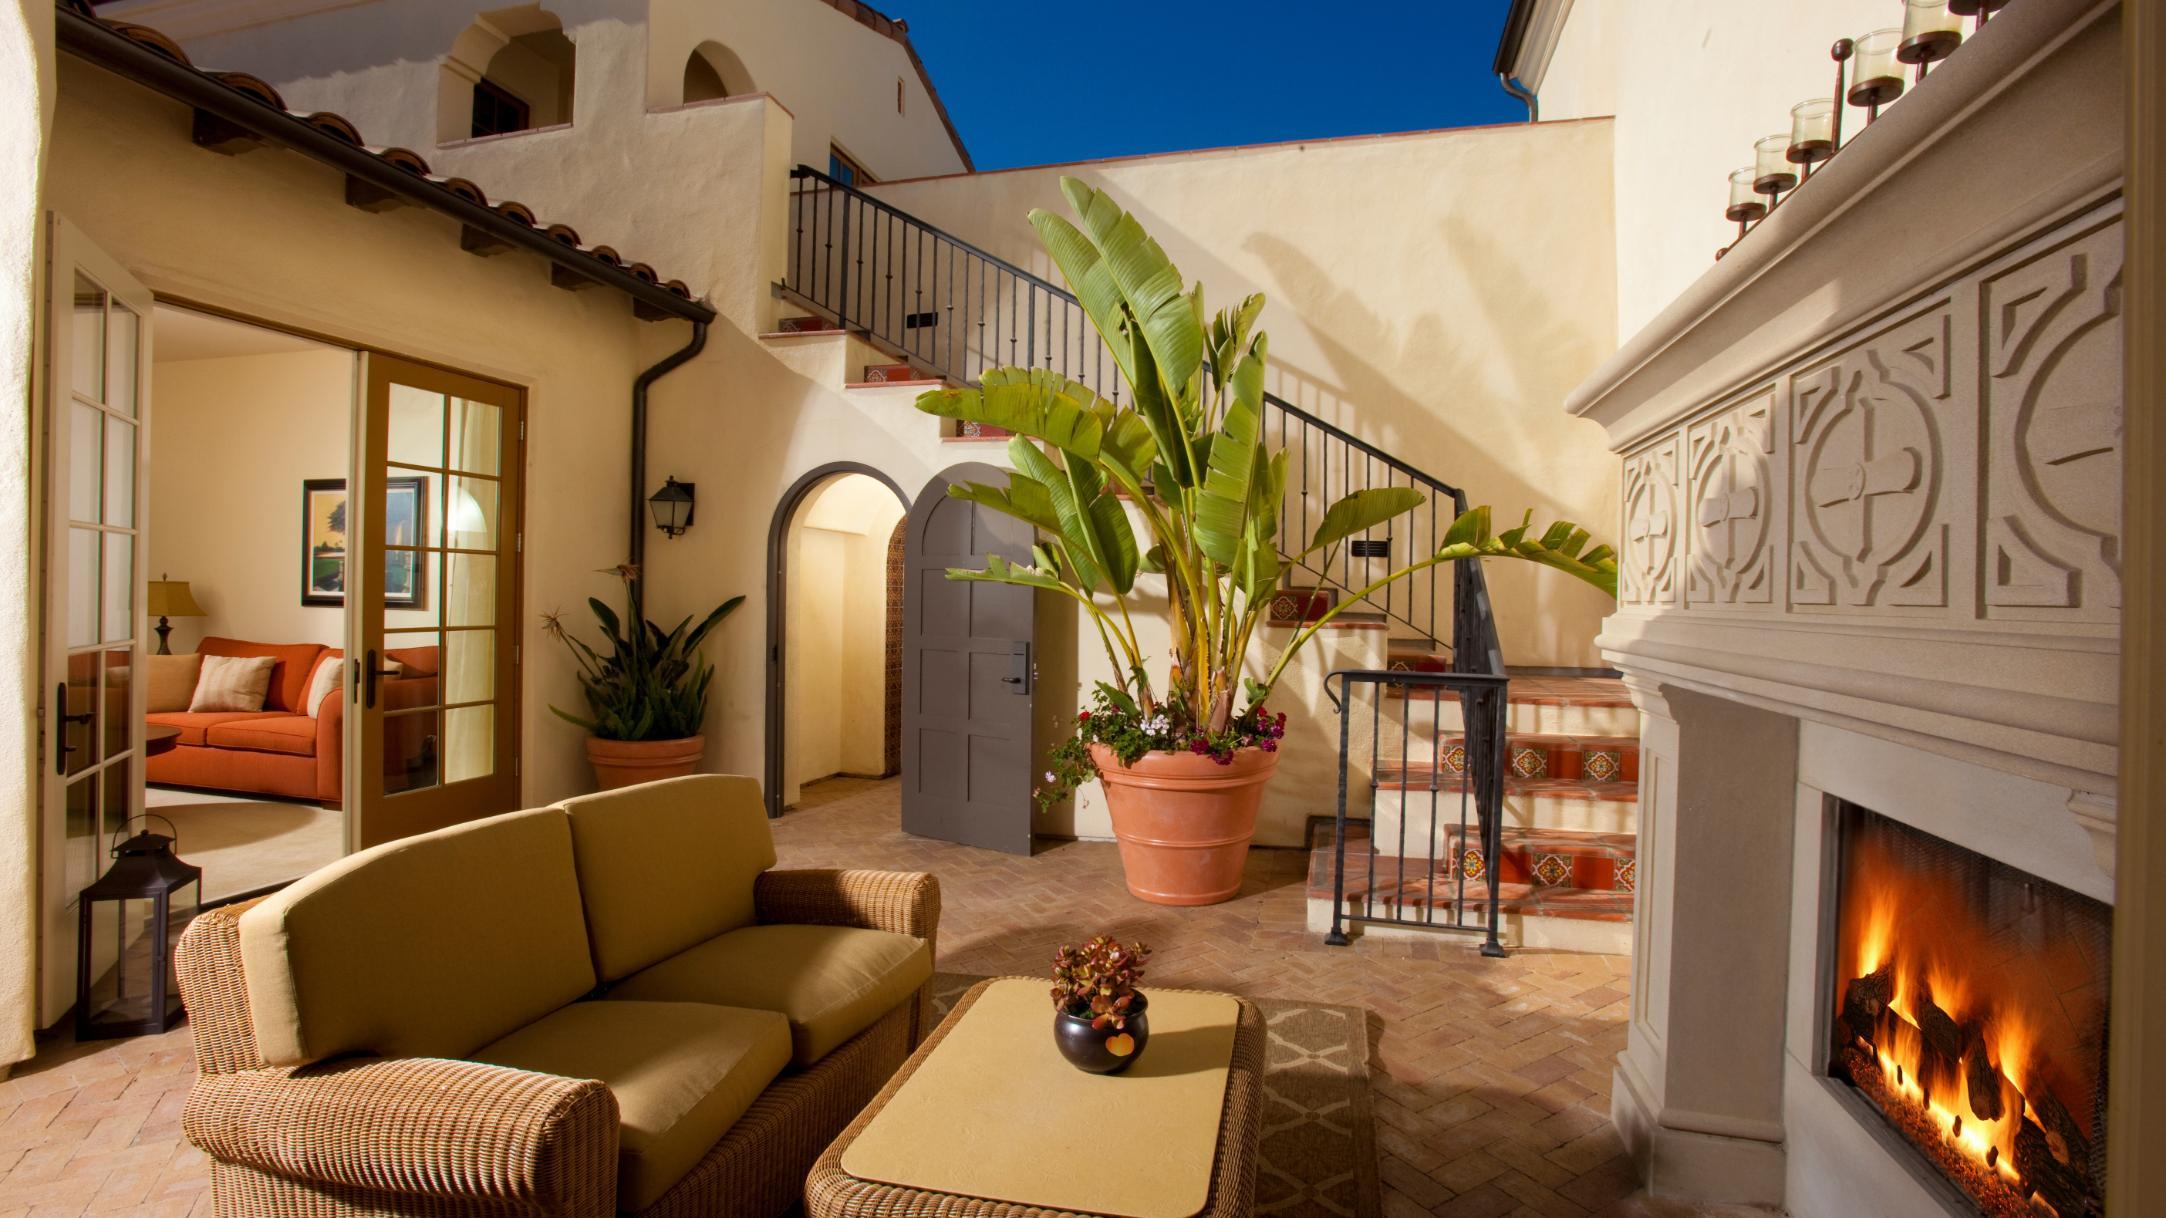 171109152430-13-cozy-hotels-redefining-luxury.jpg Shea Homes Design Studio Elena Holt on